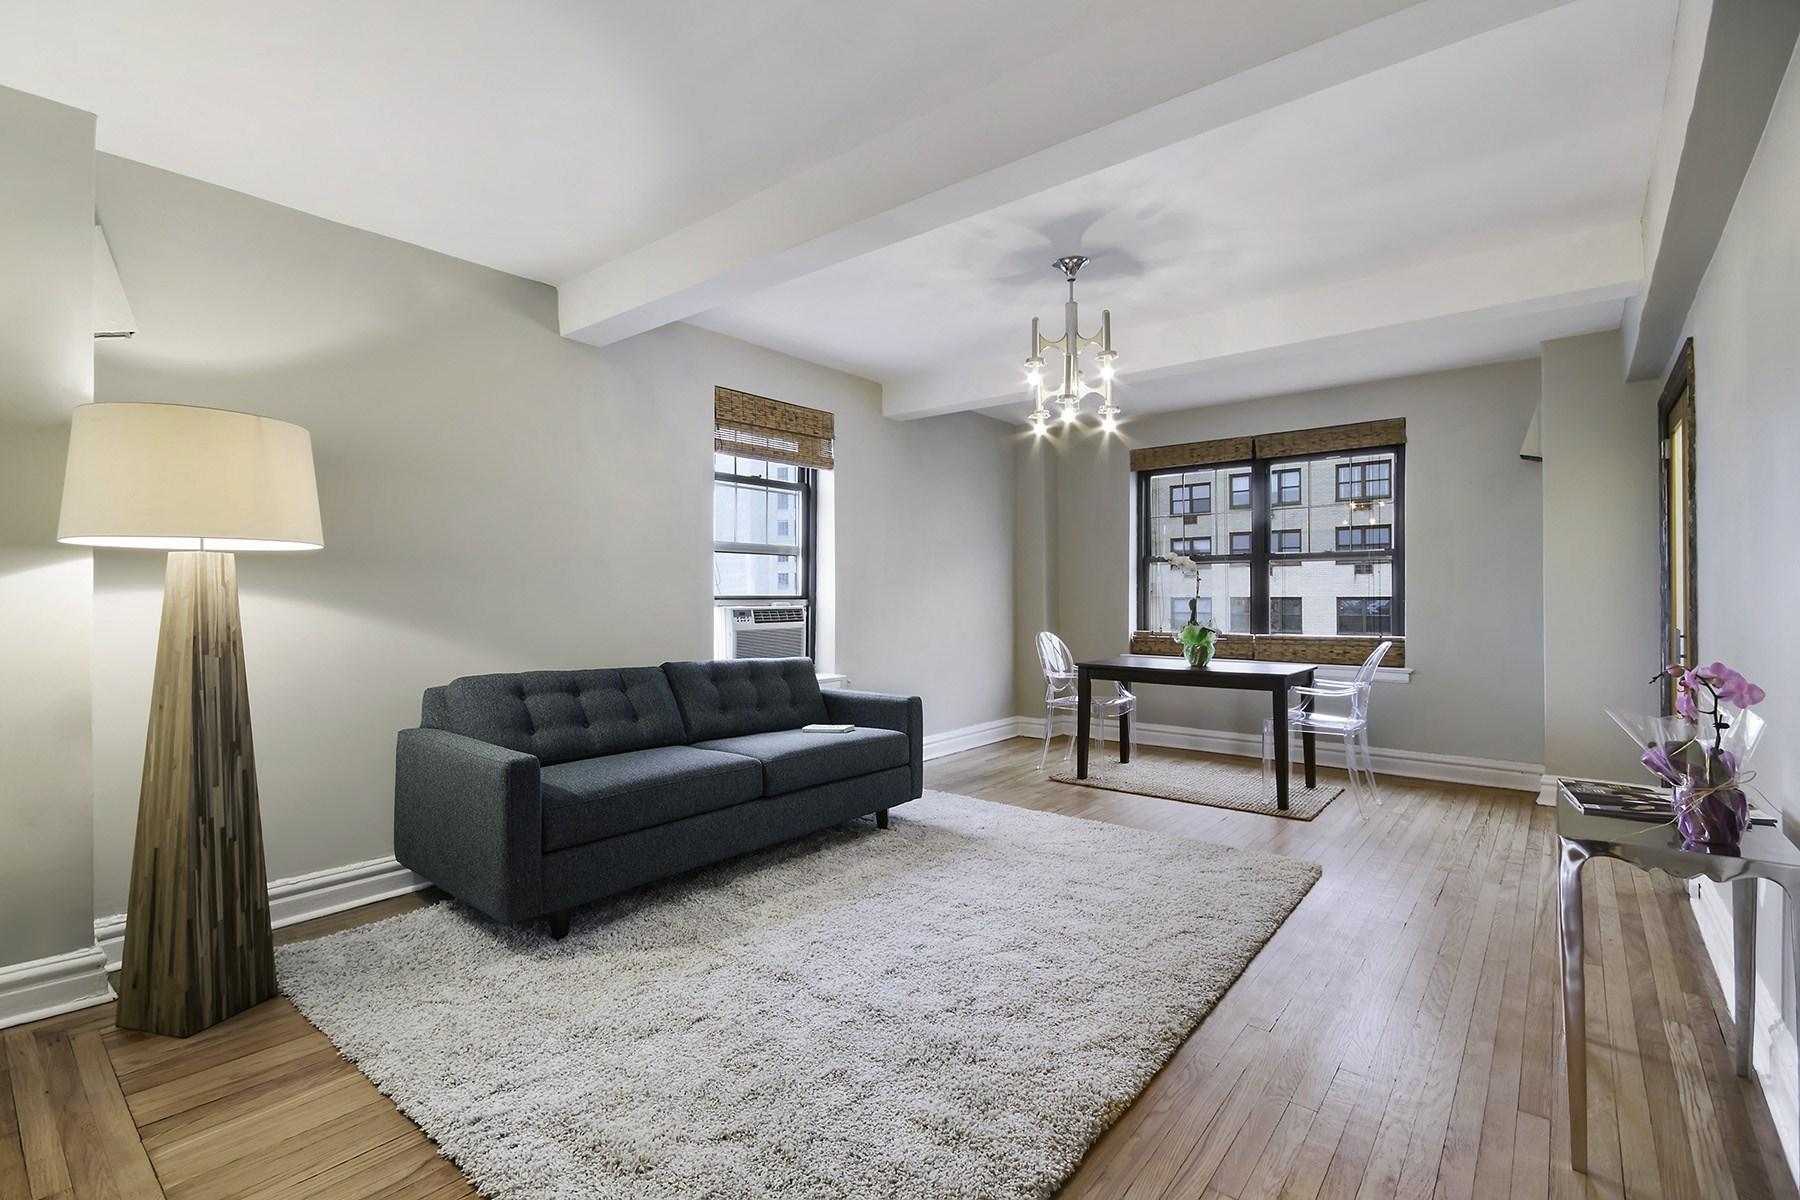 Кооперативная квартира для того Продажа на 200 East 16th Street, 12L 200 East 16th Street Apt 12L New York, Нью-Йорк, 10003 Соединенные Штаты